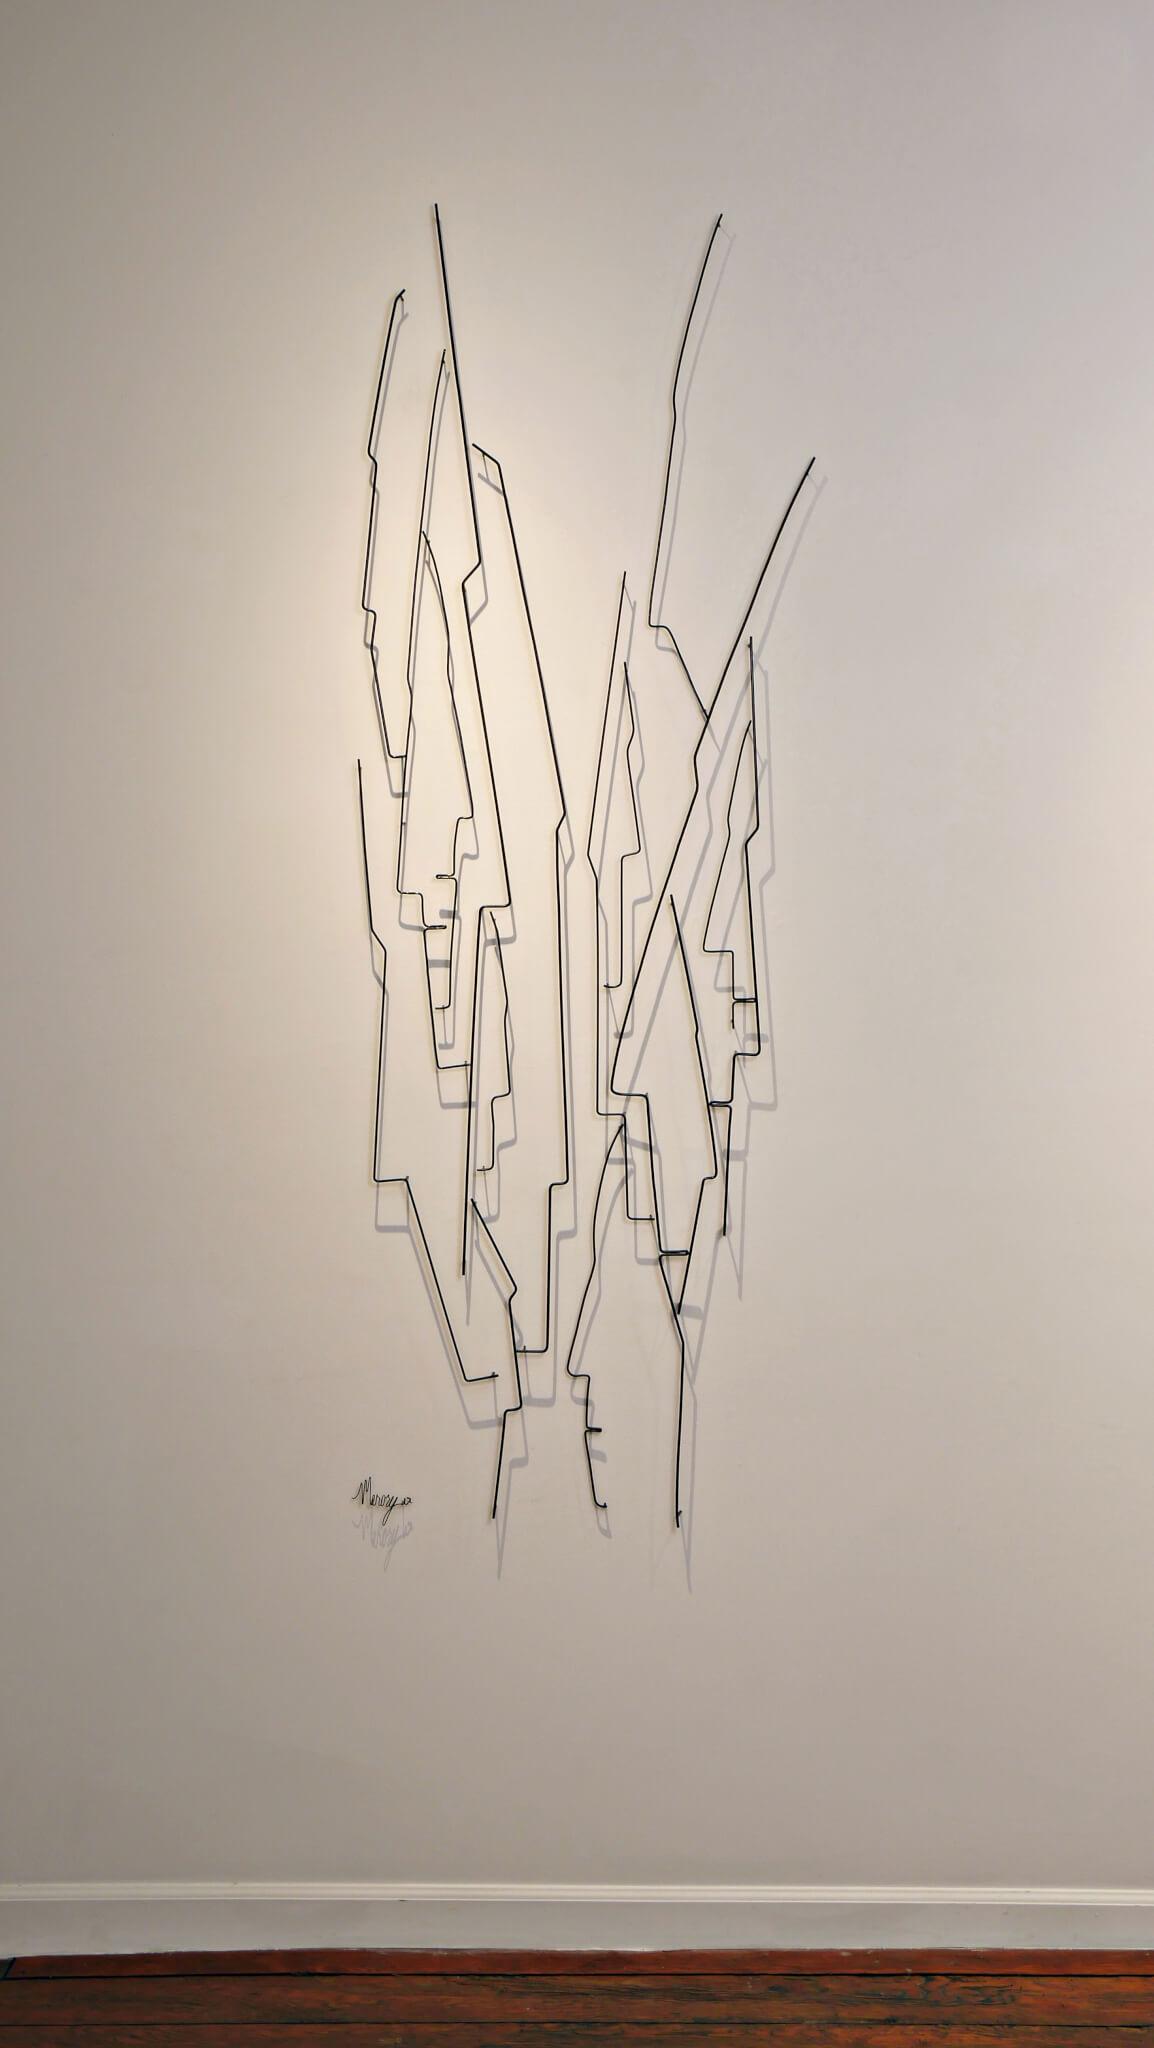 Pamela Merory Durnham, Vertical Landscape #6, wire sculpture